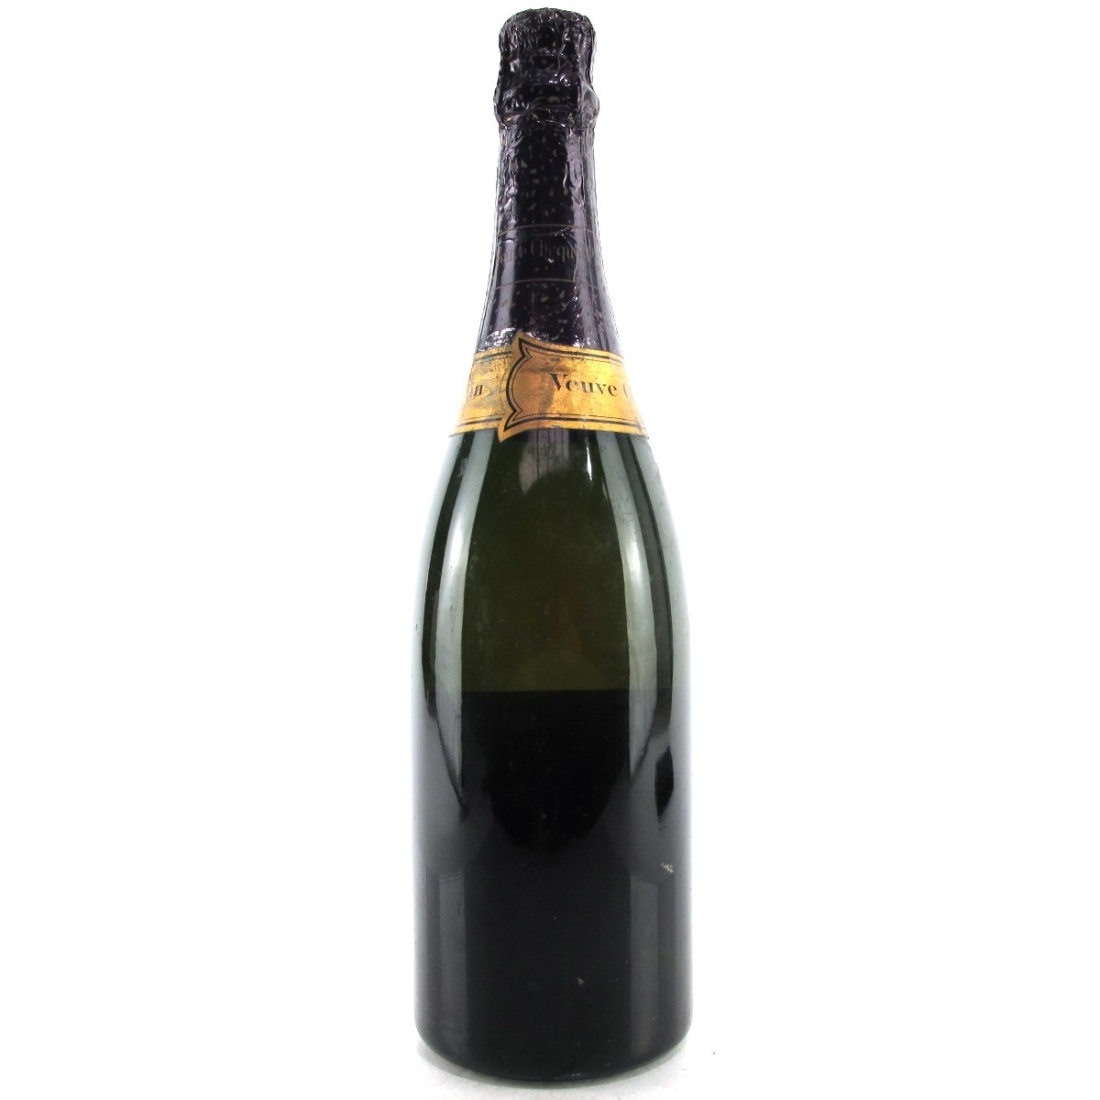 Veuve Clicquot Ponsardin 1962 Vintage Champagne